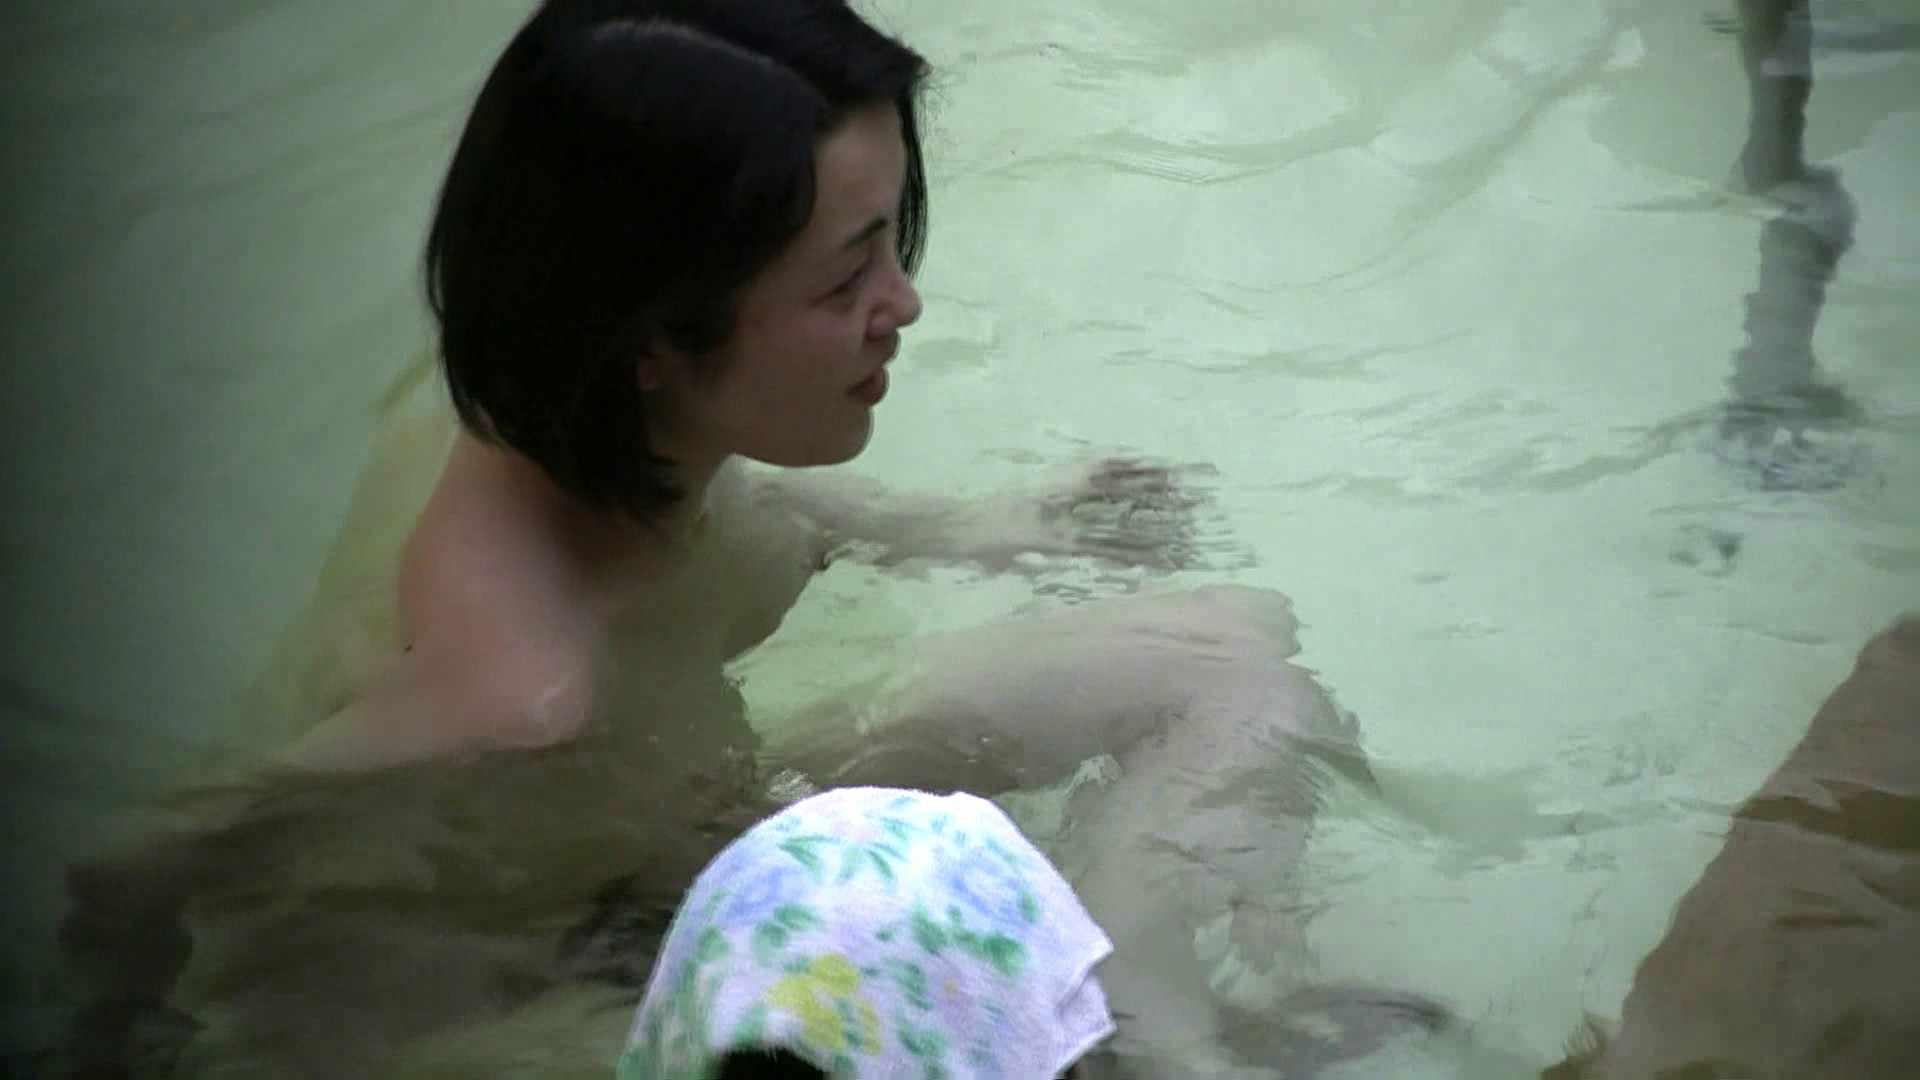 Aquaな露天風呂Vol.651 盗撮師作品 エロ無料画像 74pic 59